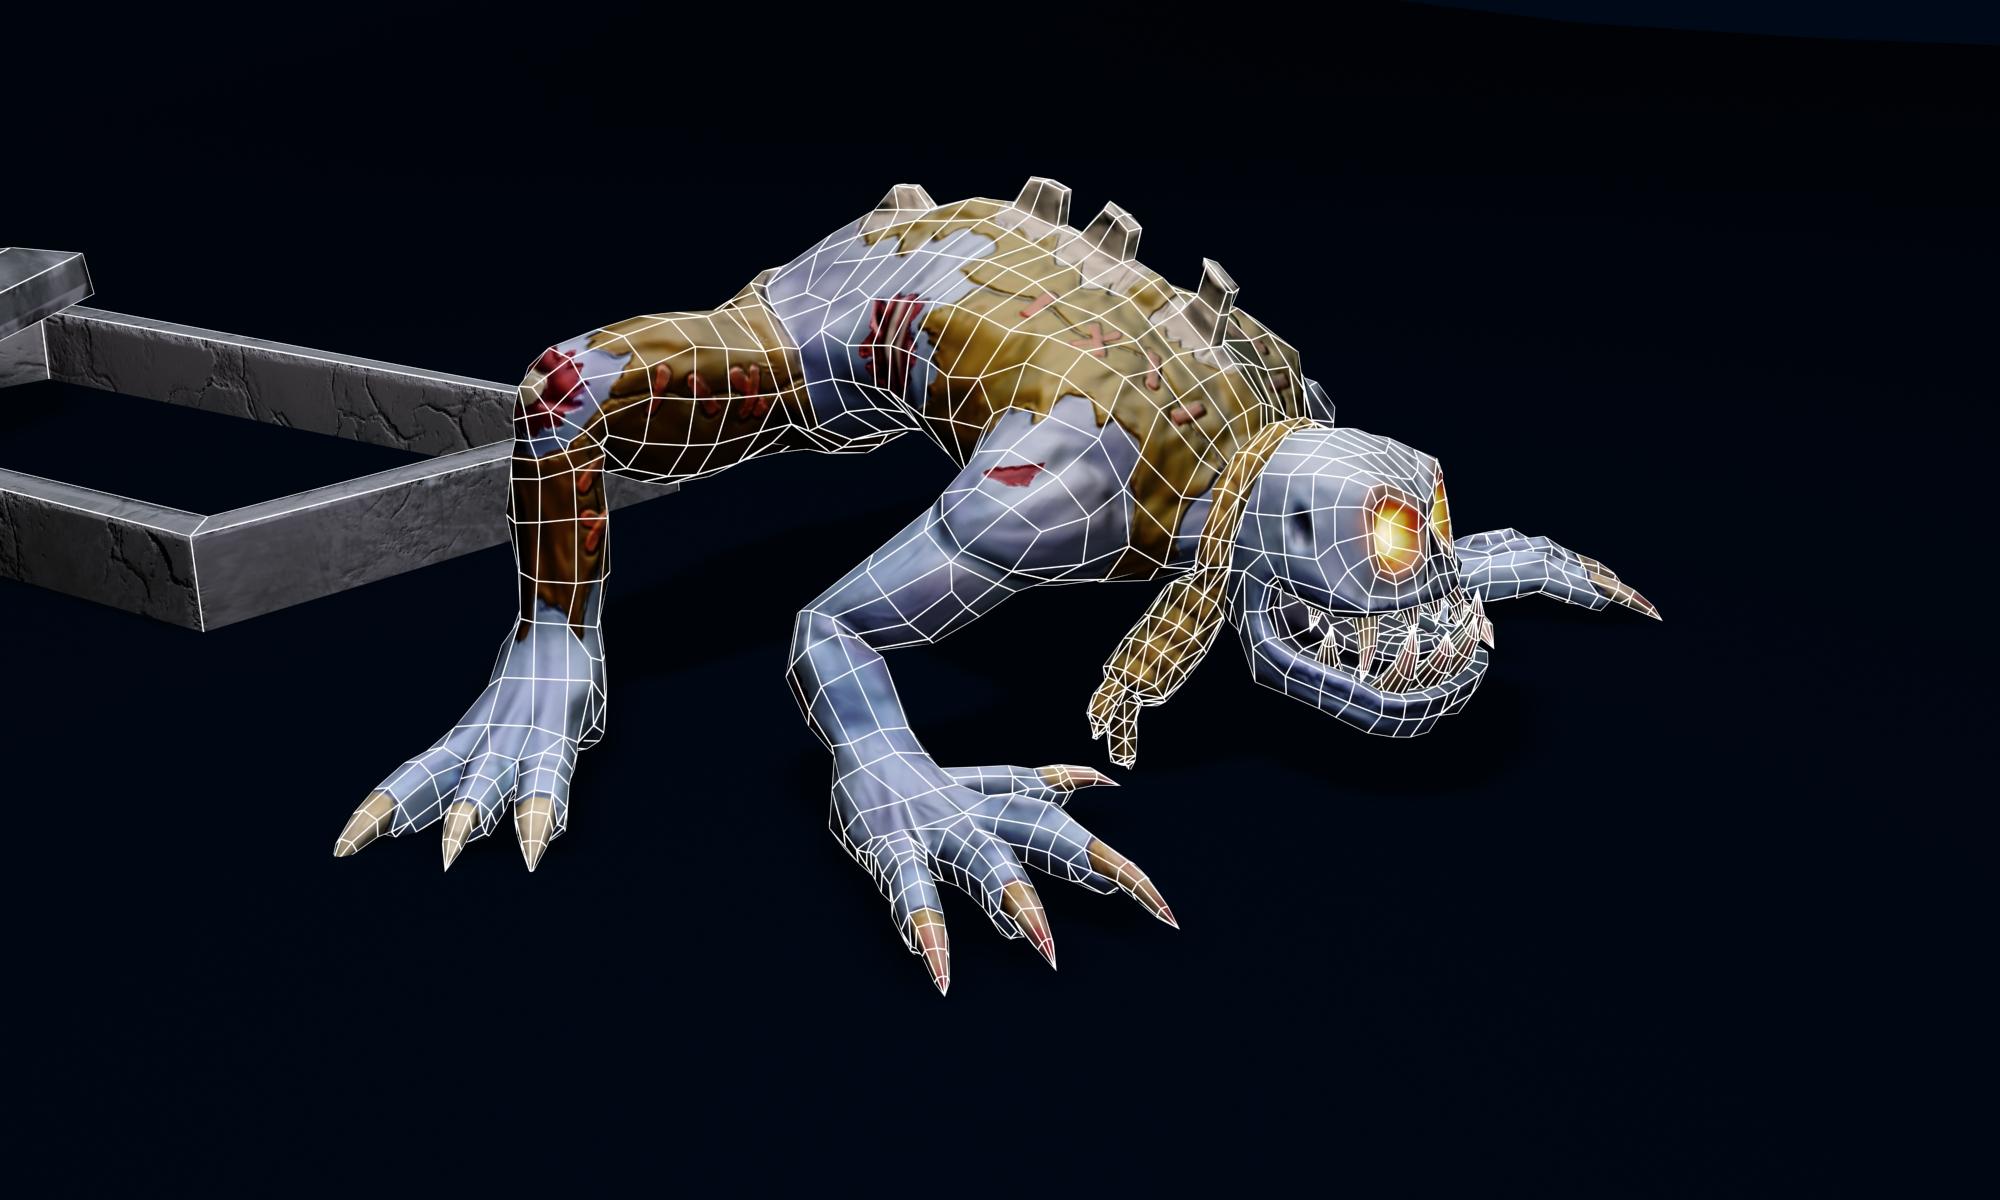 zombi (ghoul) 3d model max fbx obj 212444